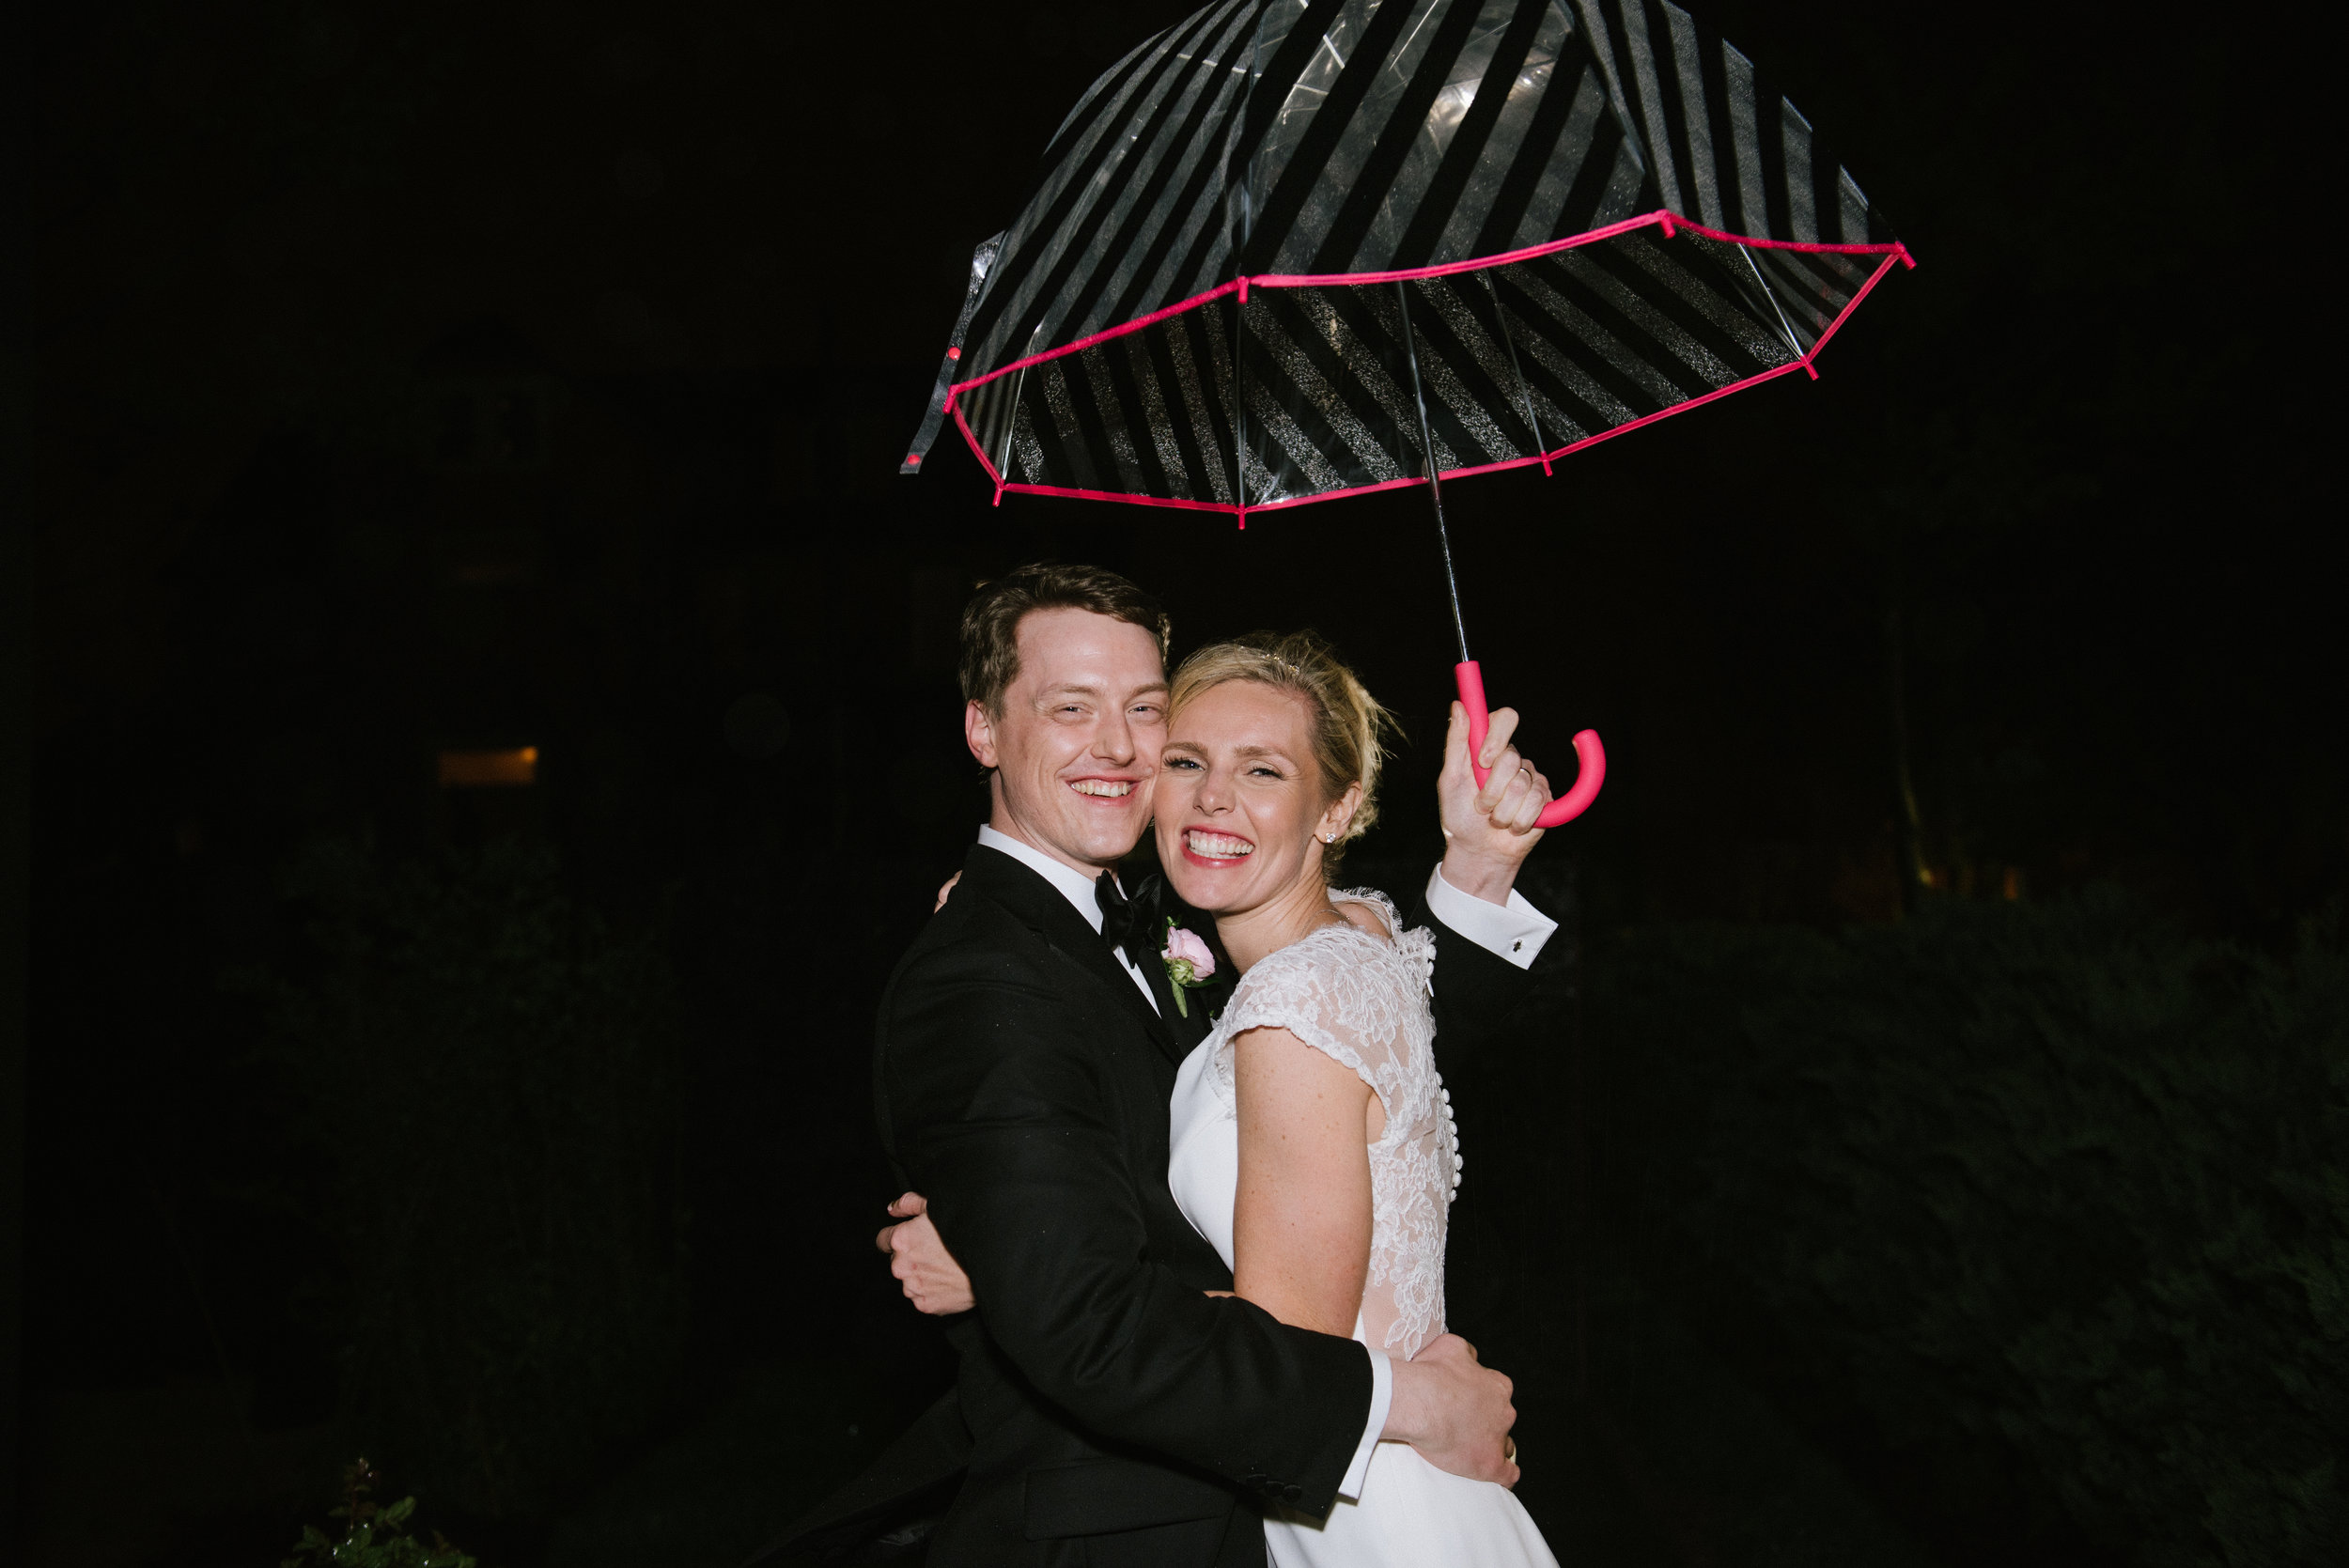 Martha stewart weddings - don't stress your wedding weather